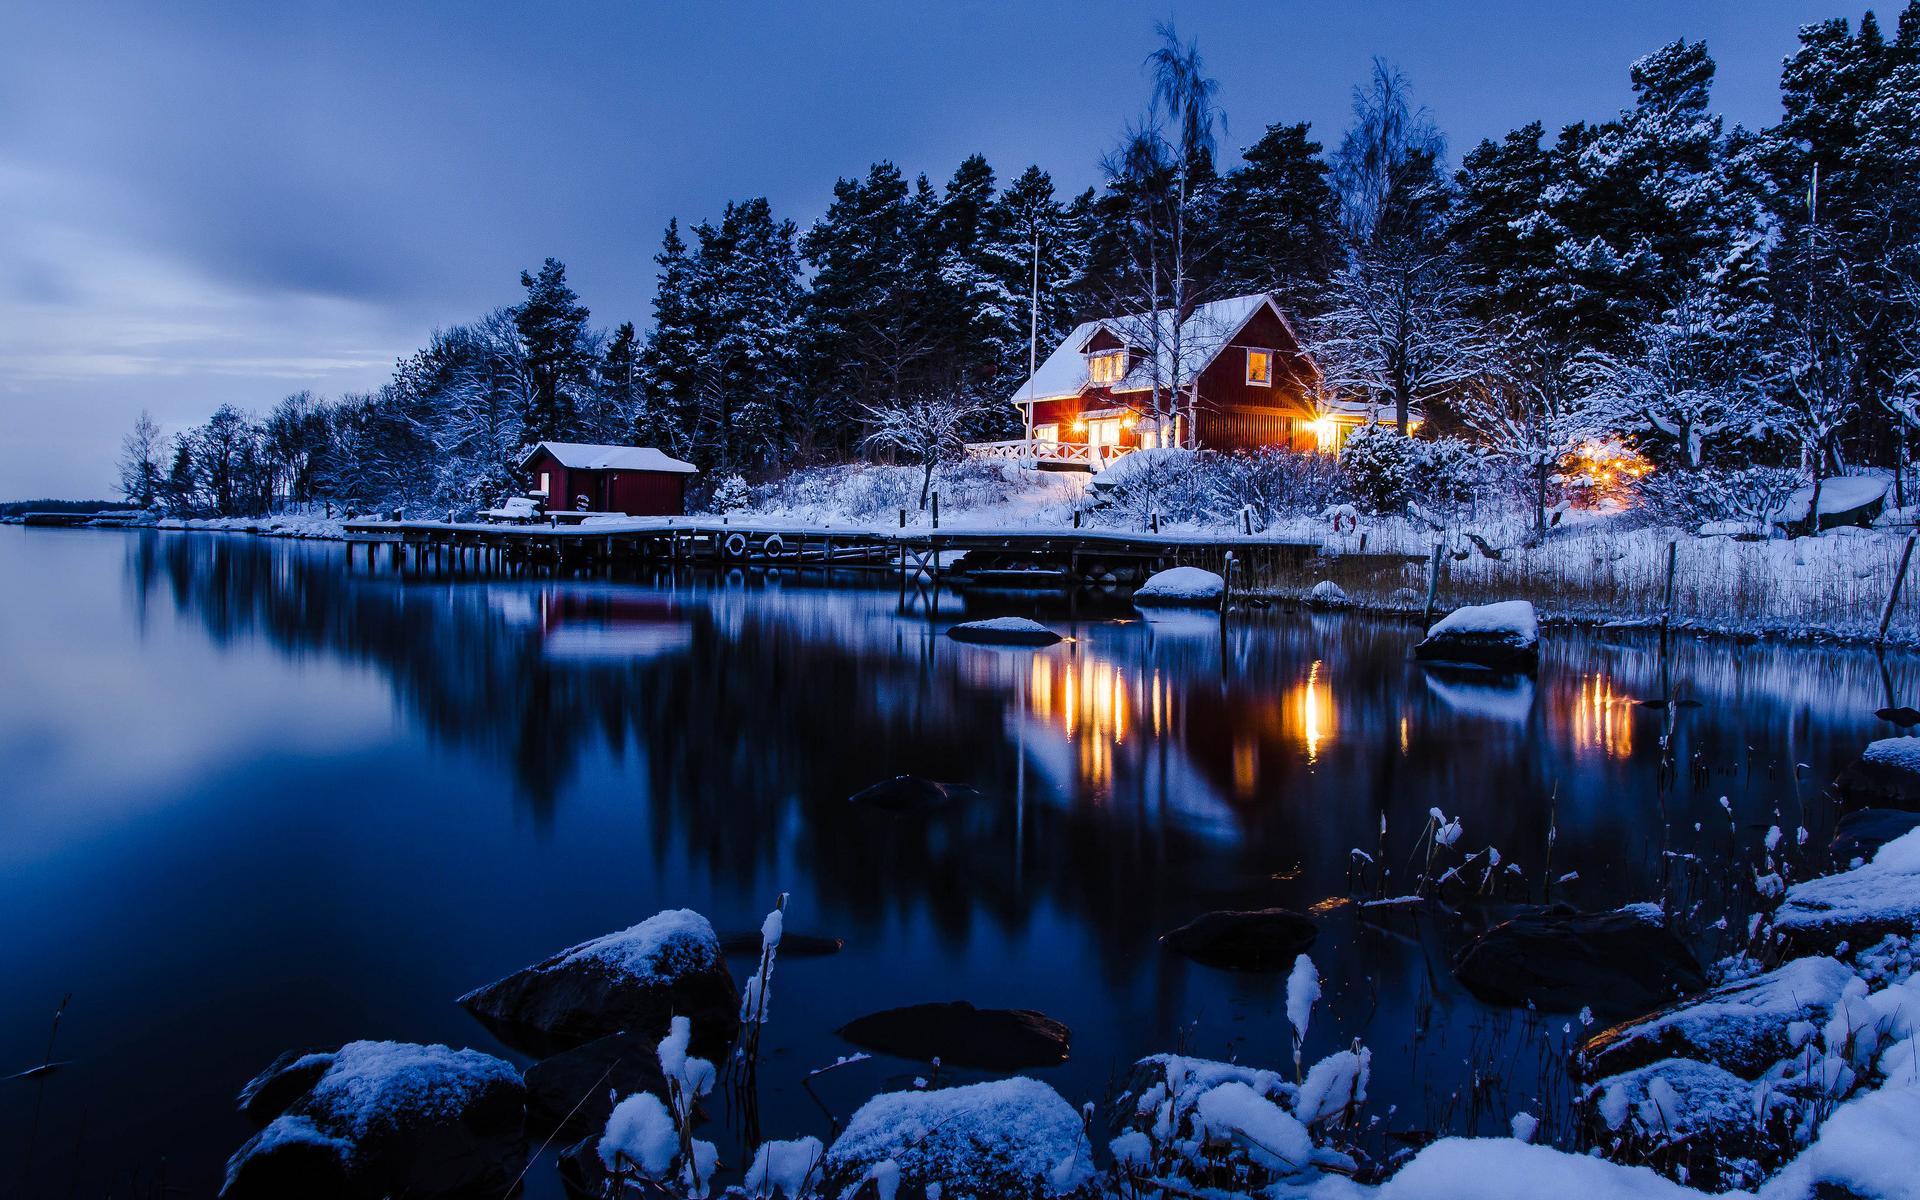 Winter Night Scenes Wallpaper.